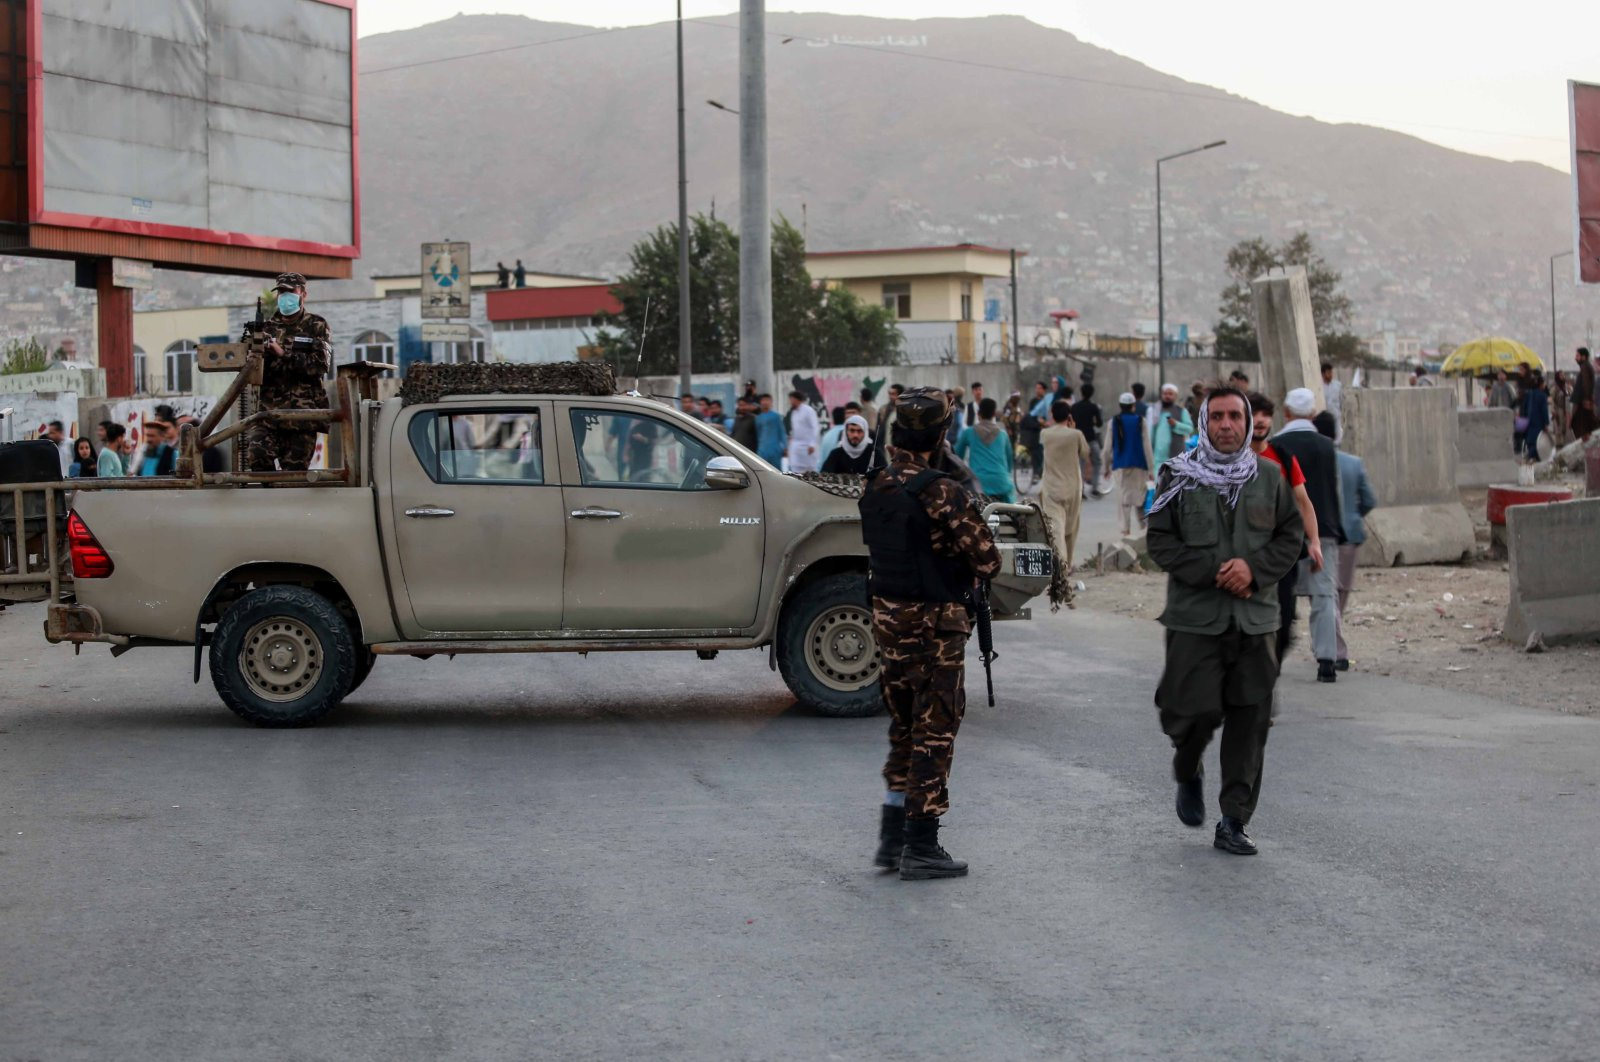 Taliban stand guard near the scene of a bomb blast in Kabul, Afghanistan, Oct. 3, 2021. (EPA Photo)